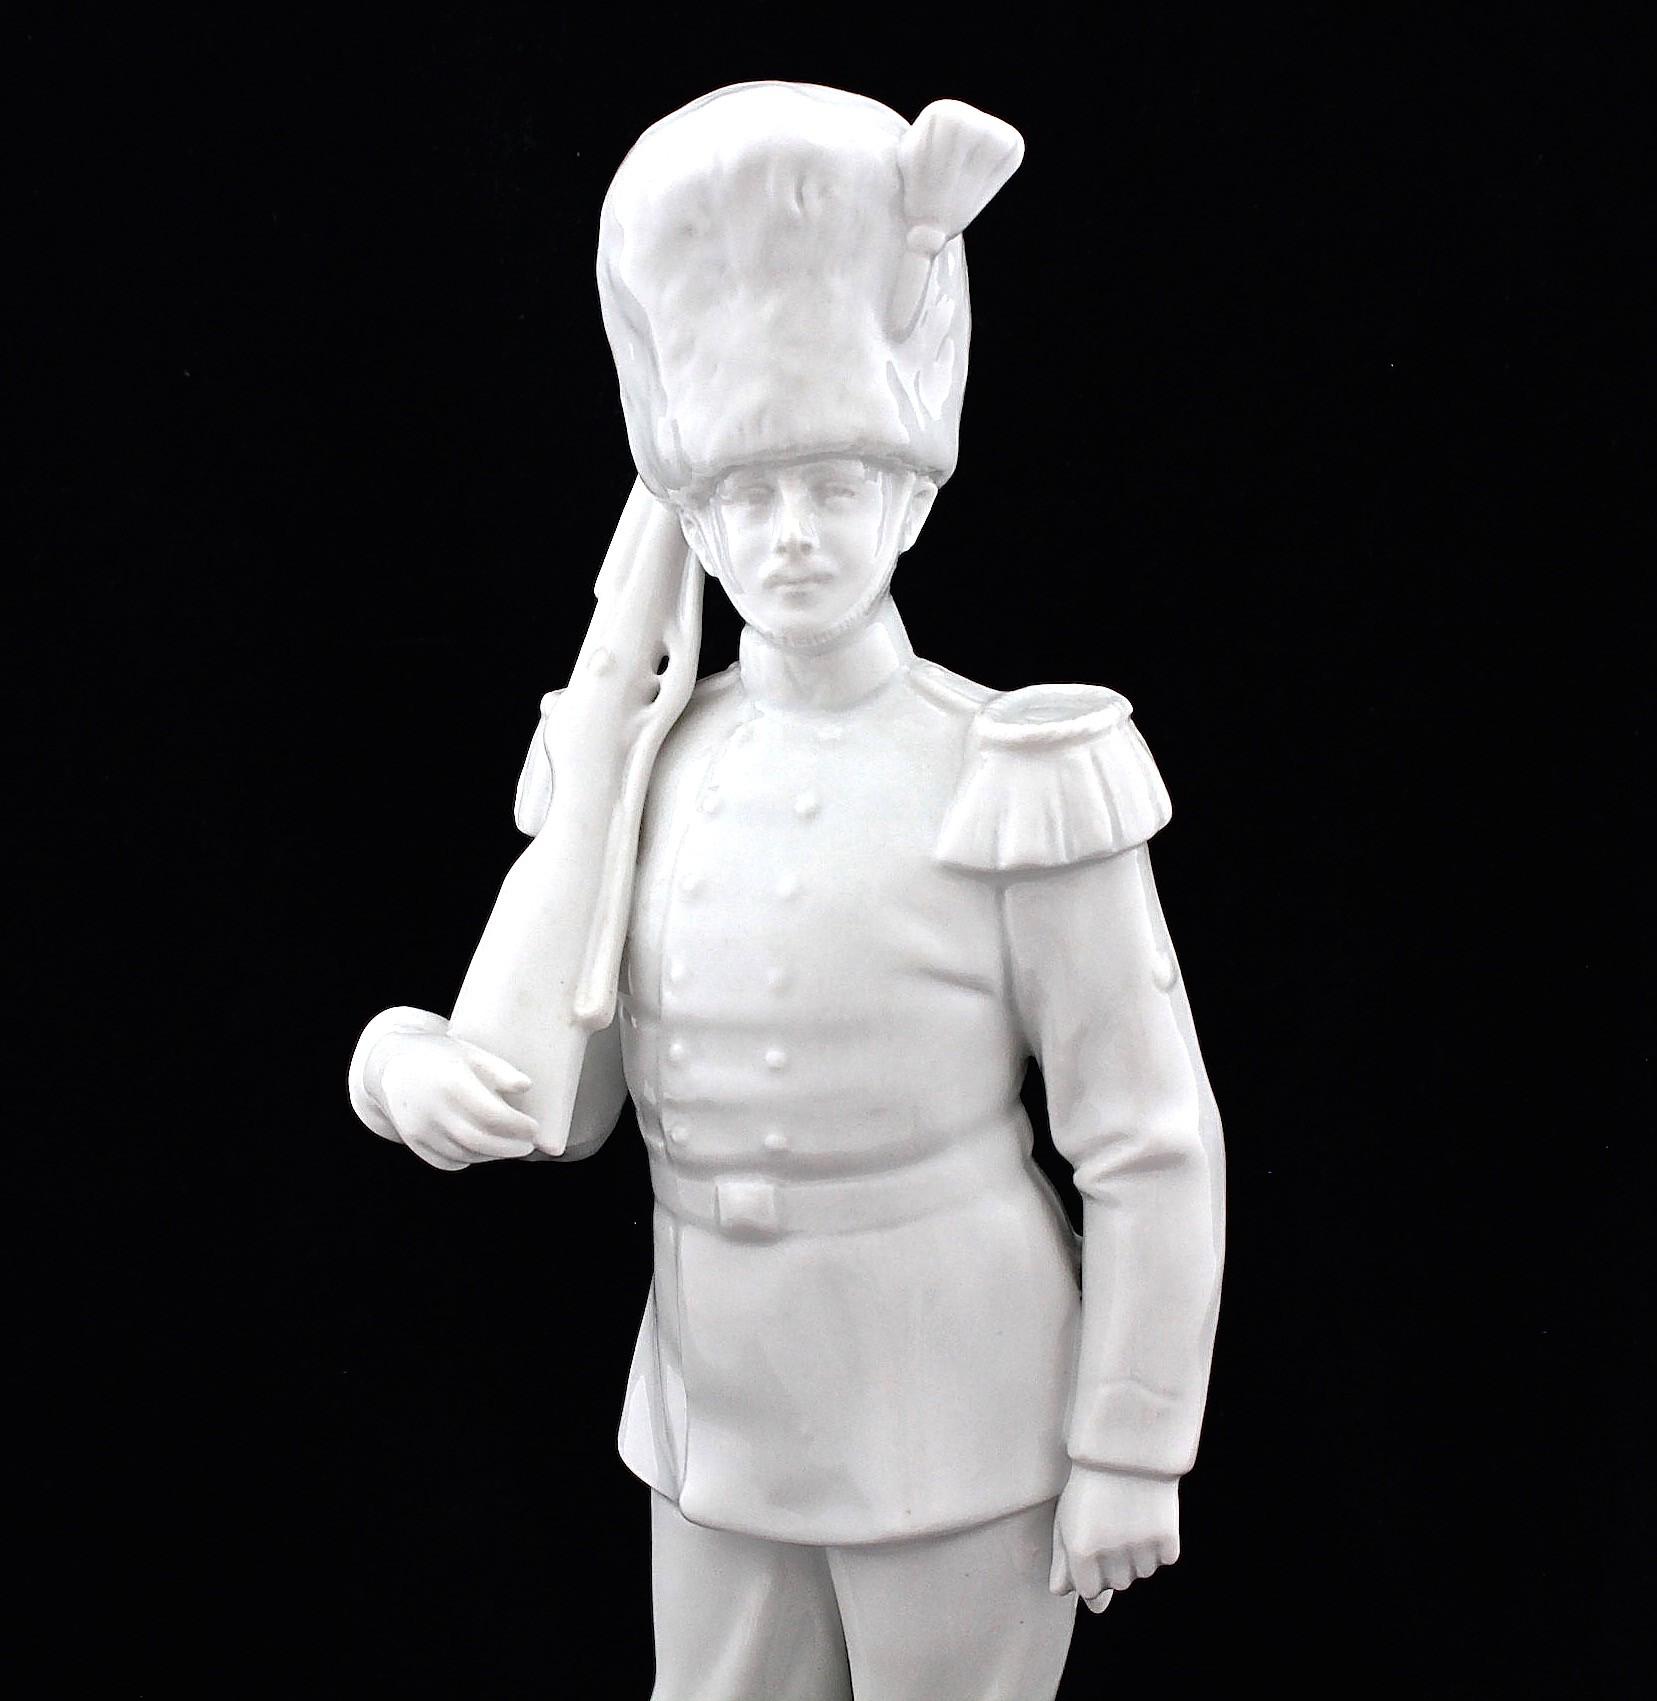 Коллекционная статуэтка. Фарфор. Баталия